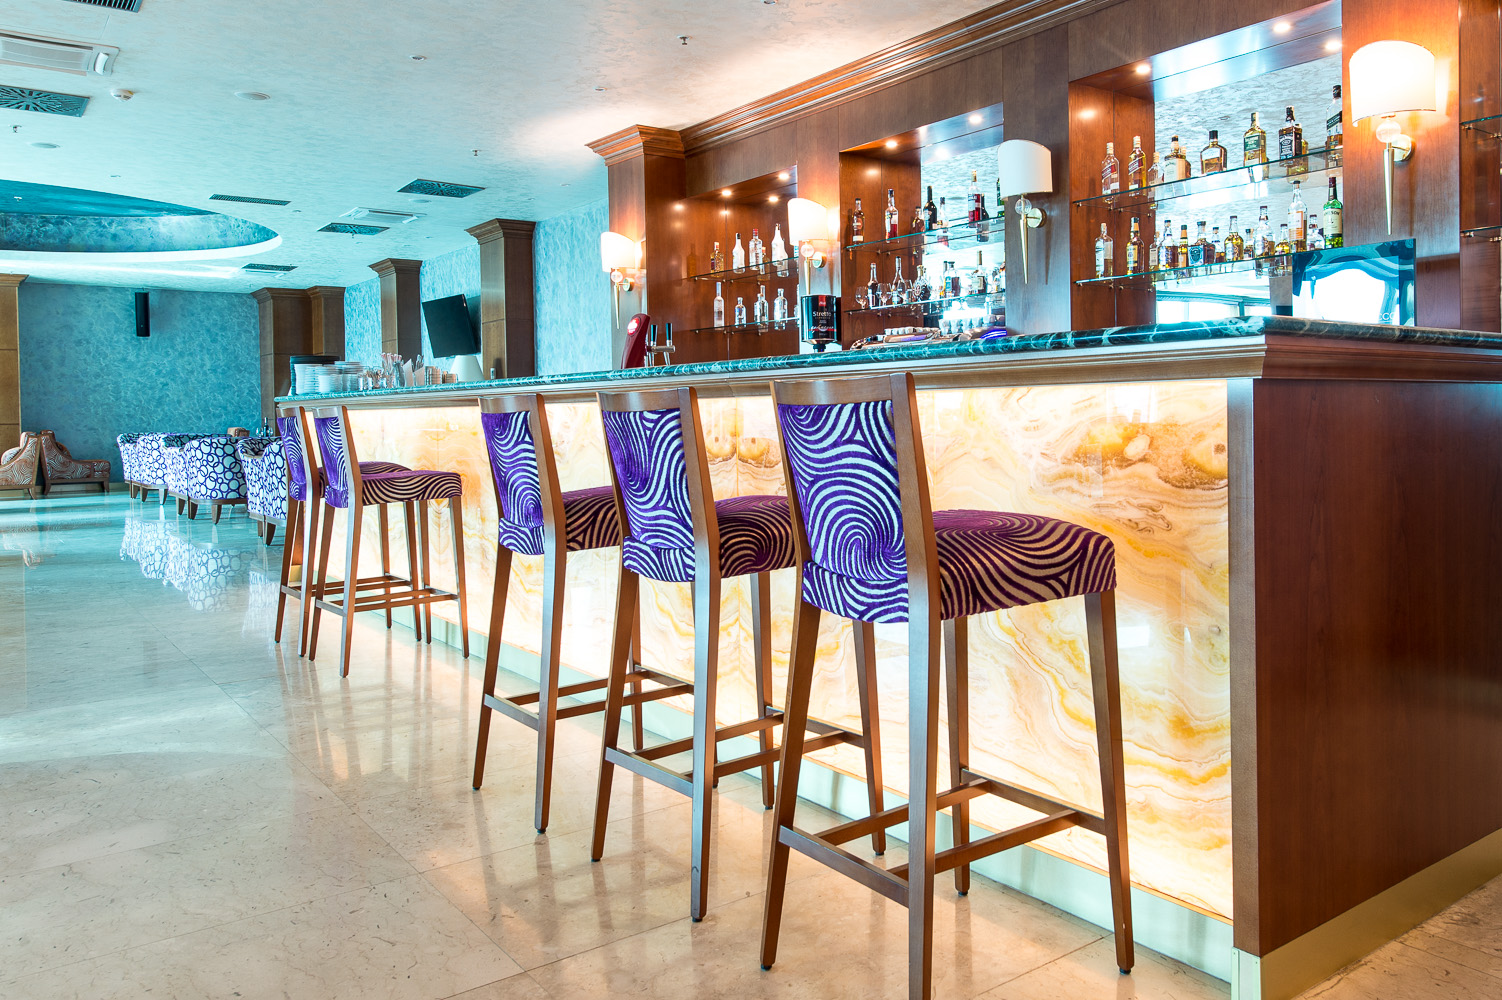 hotel-Mellain-Tuzla_oprema-javnega-dela_hotelske-sobe_oprema-hotela_hotel-furniture_lobby_restaurant_classic-furniture_10